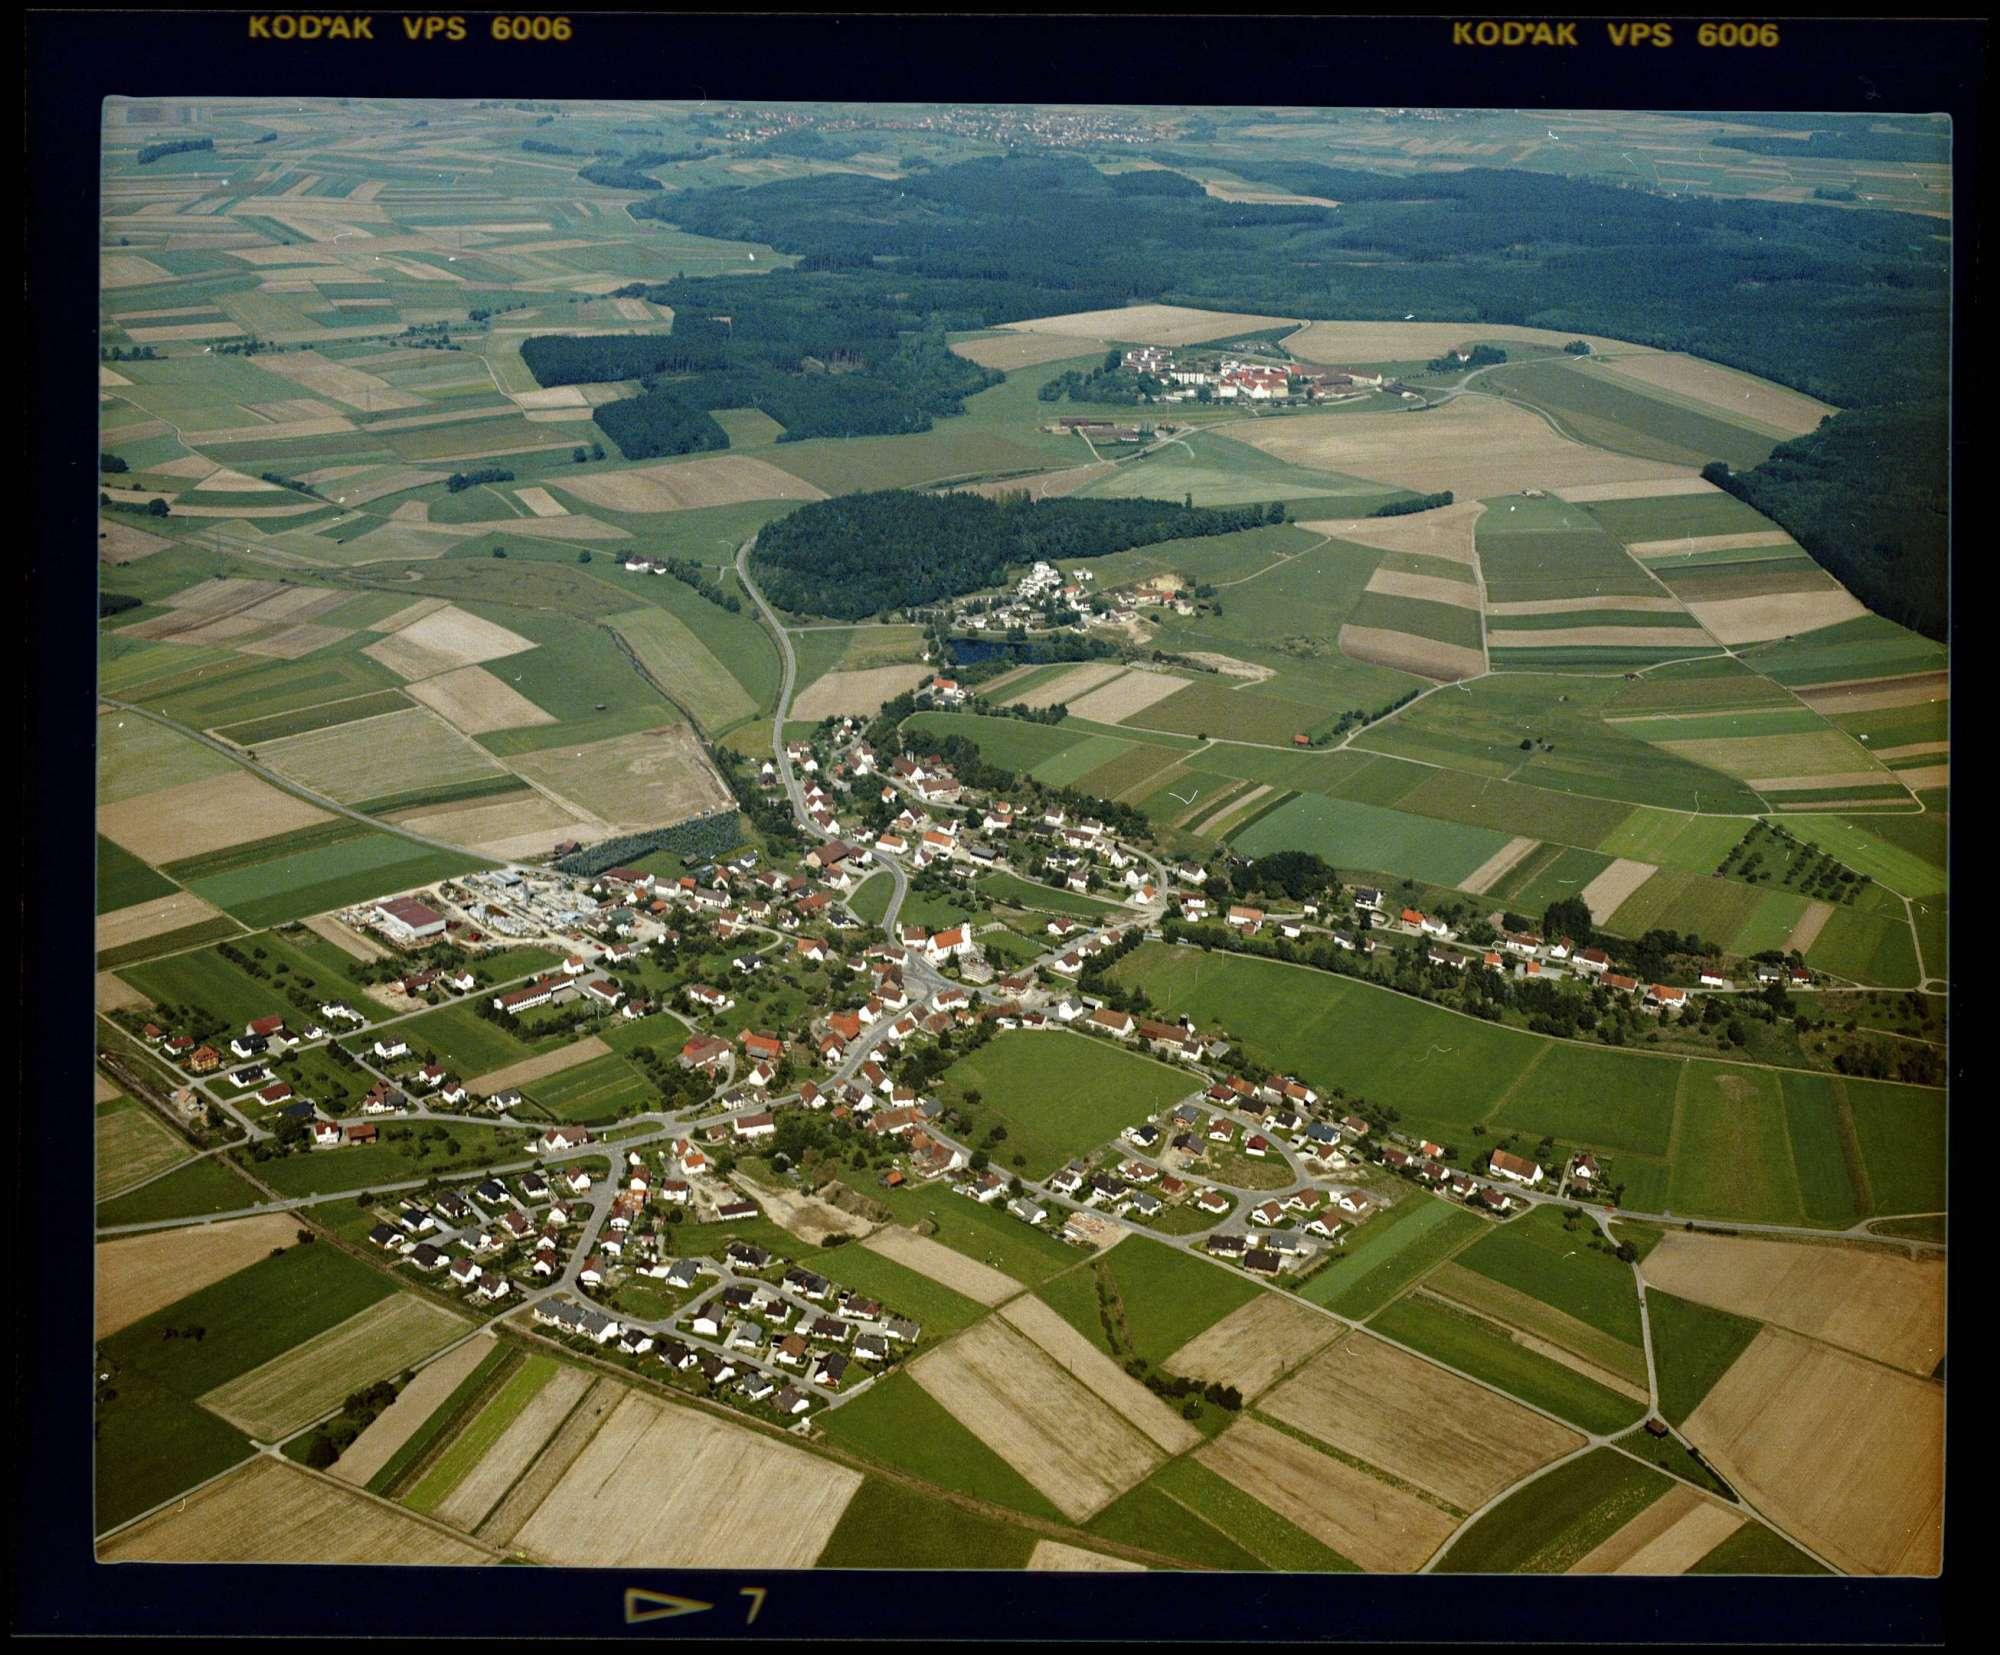 Maselheim, Luftbild, Bild 1